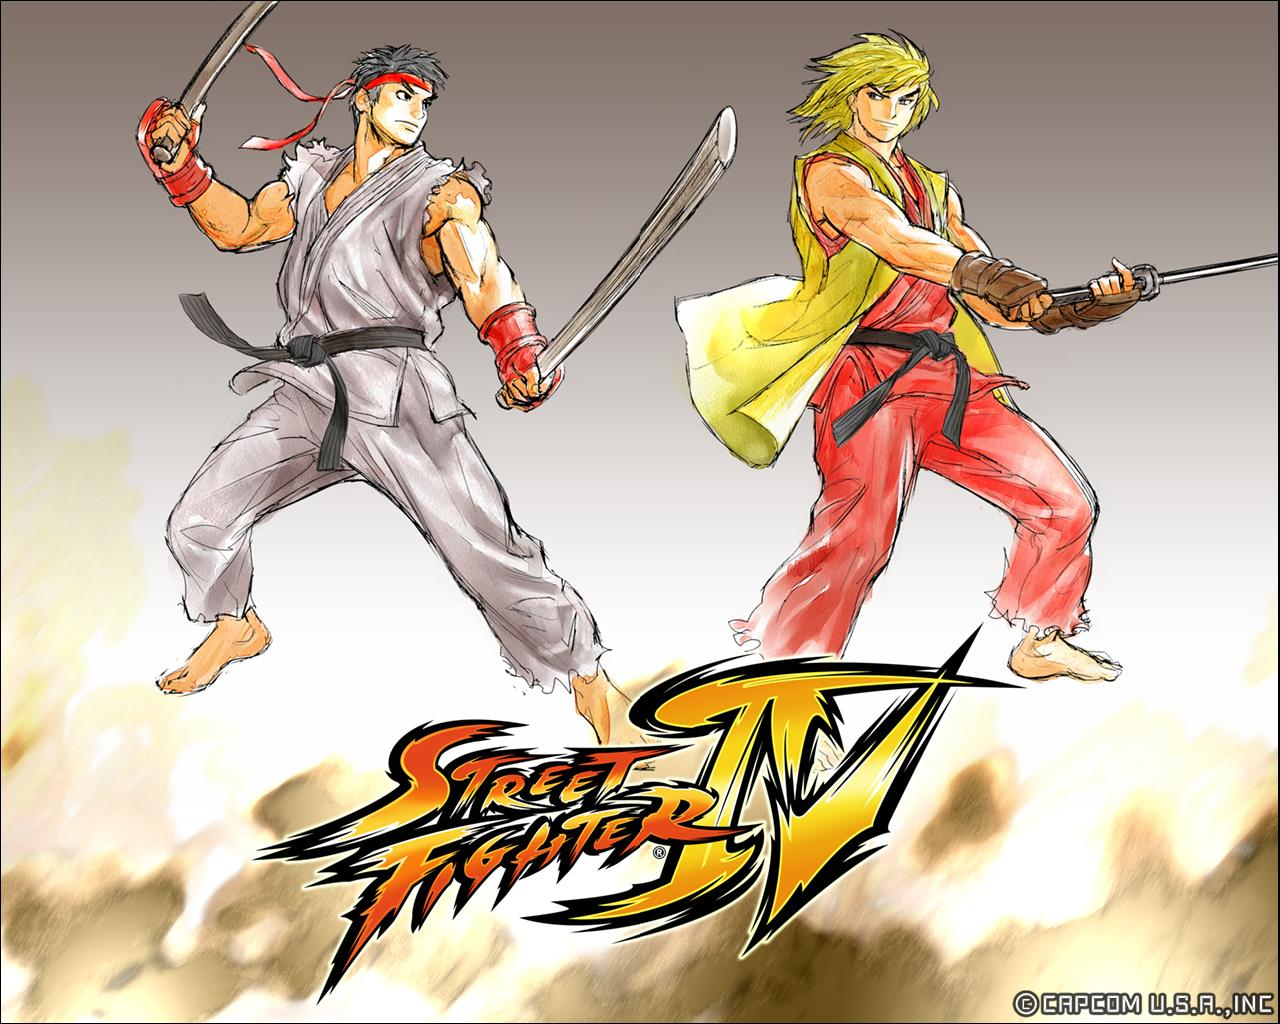 Обои Street Fighter 4 На мечах